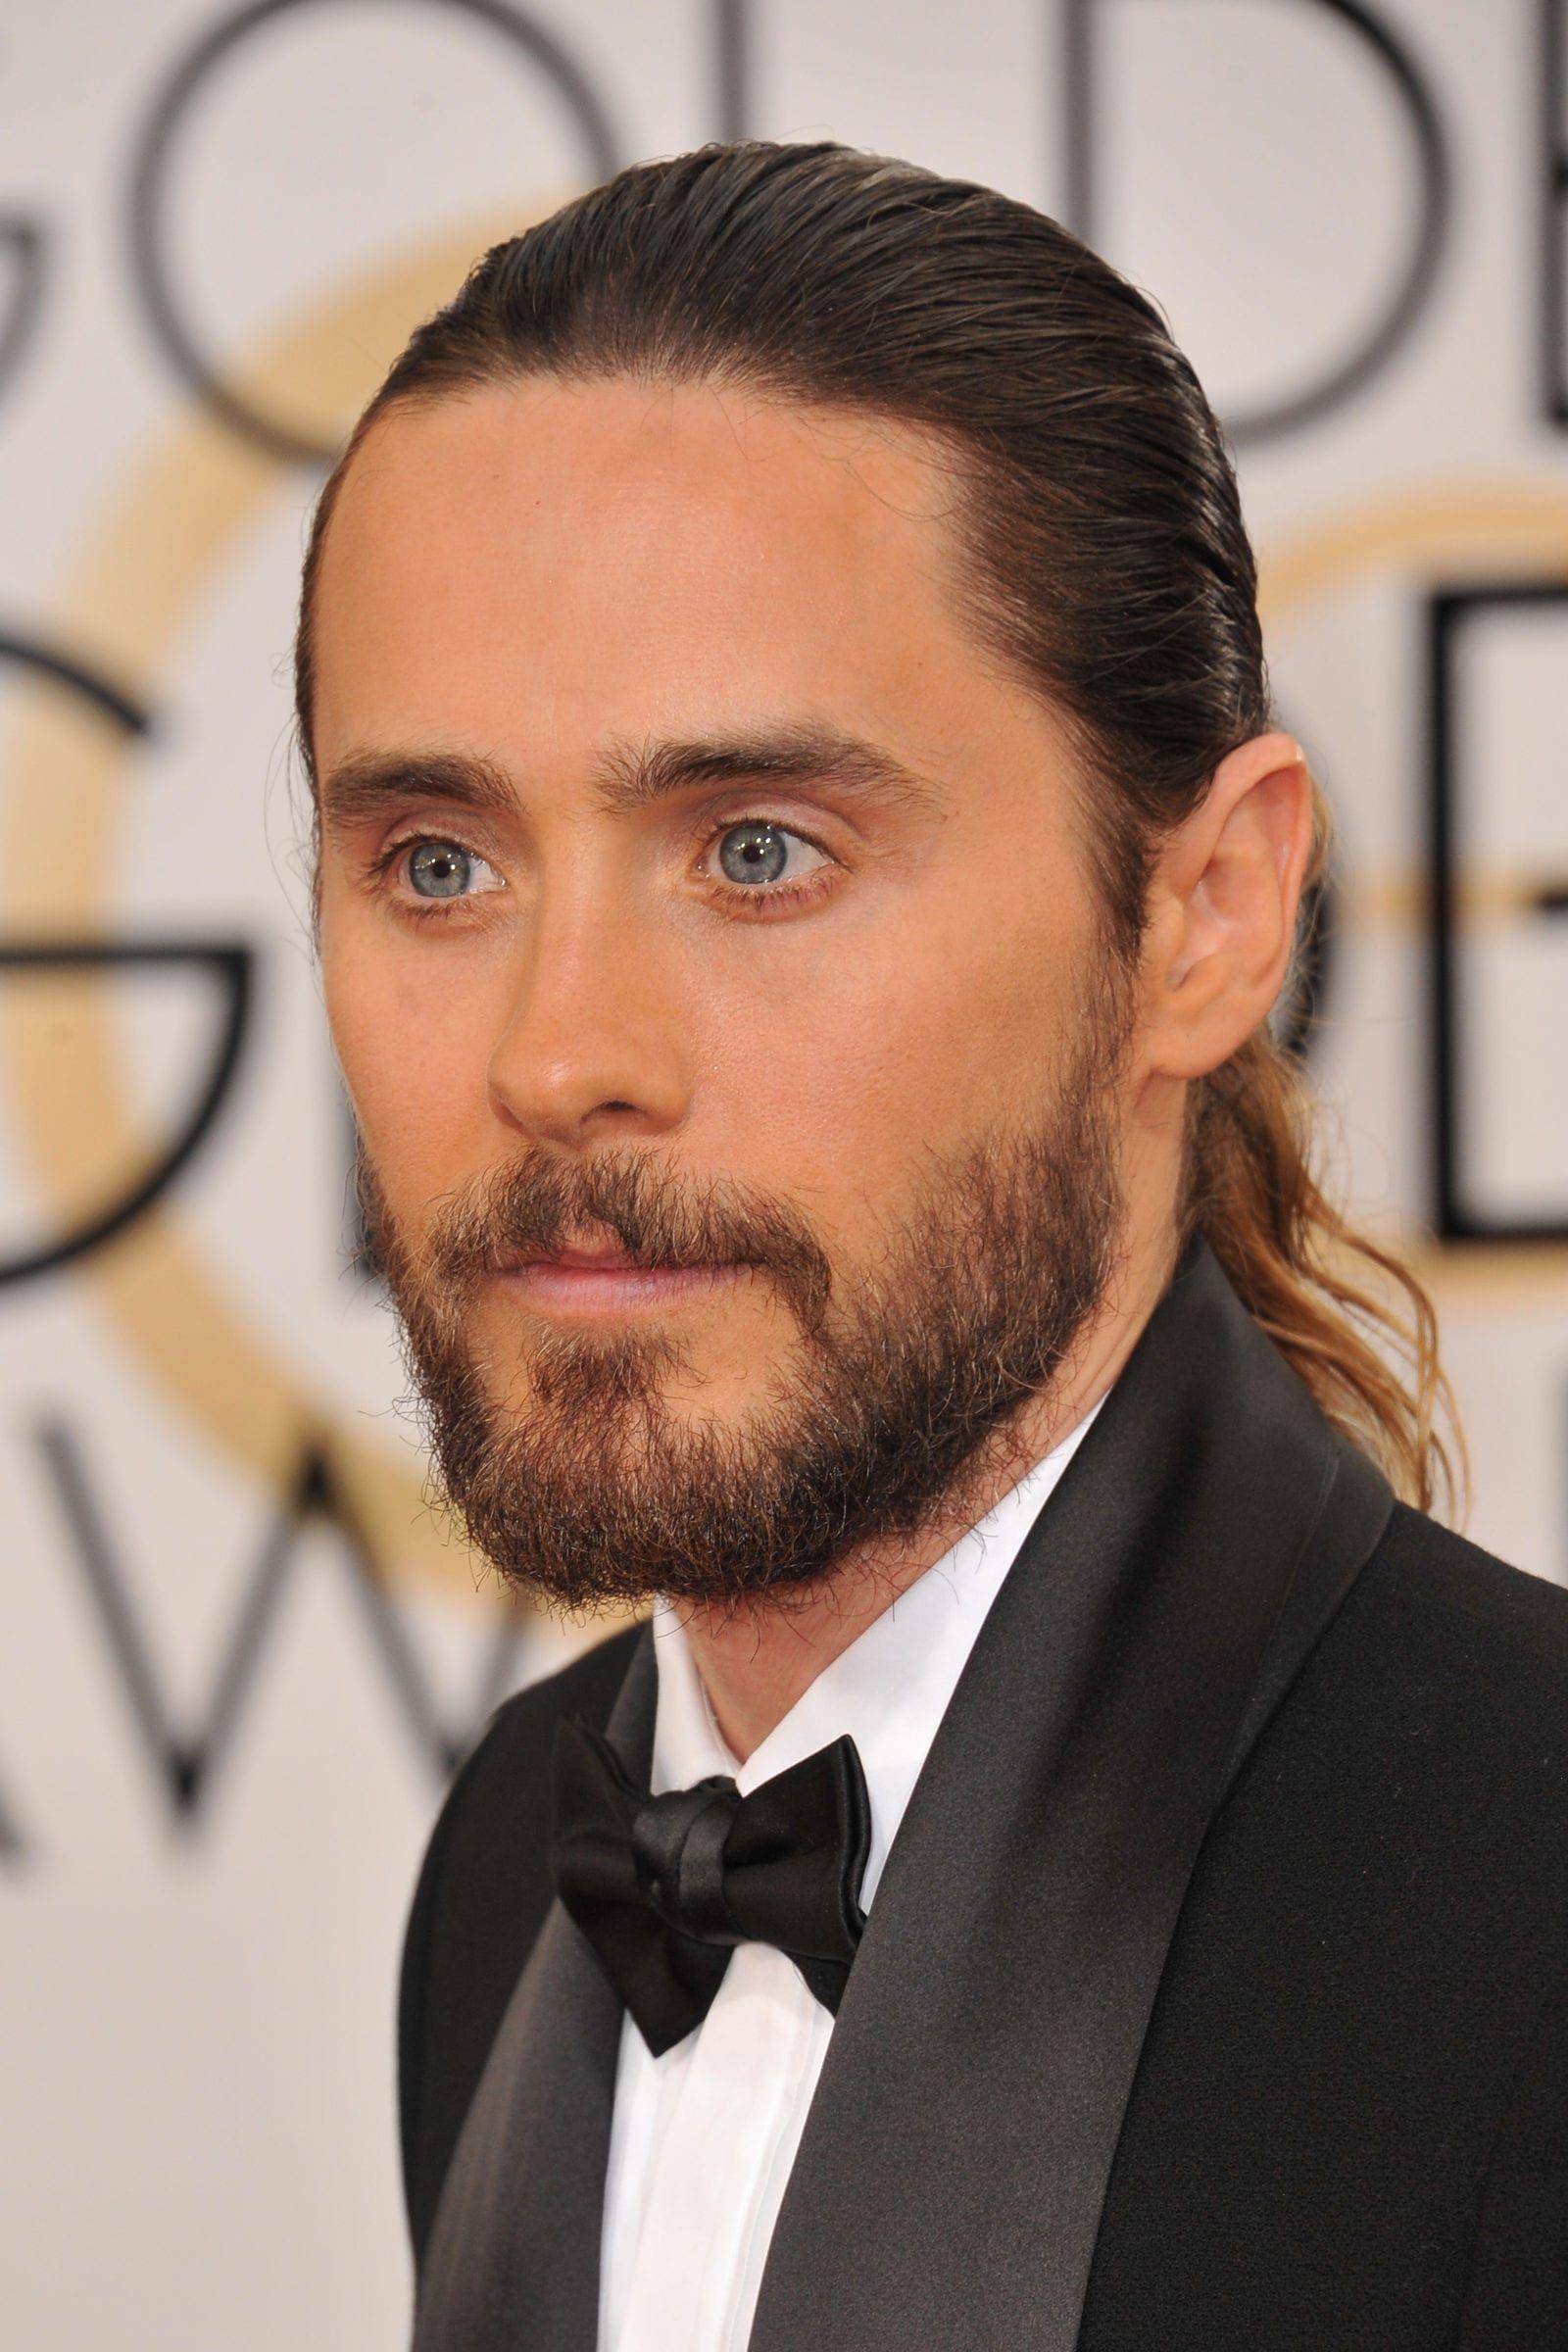 10 Modern Long Hairstyles For Men In 2021 Long Hair Styles Men Long Hair Styles Hair Styles